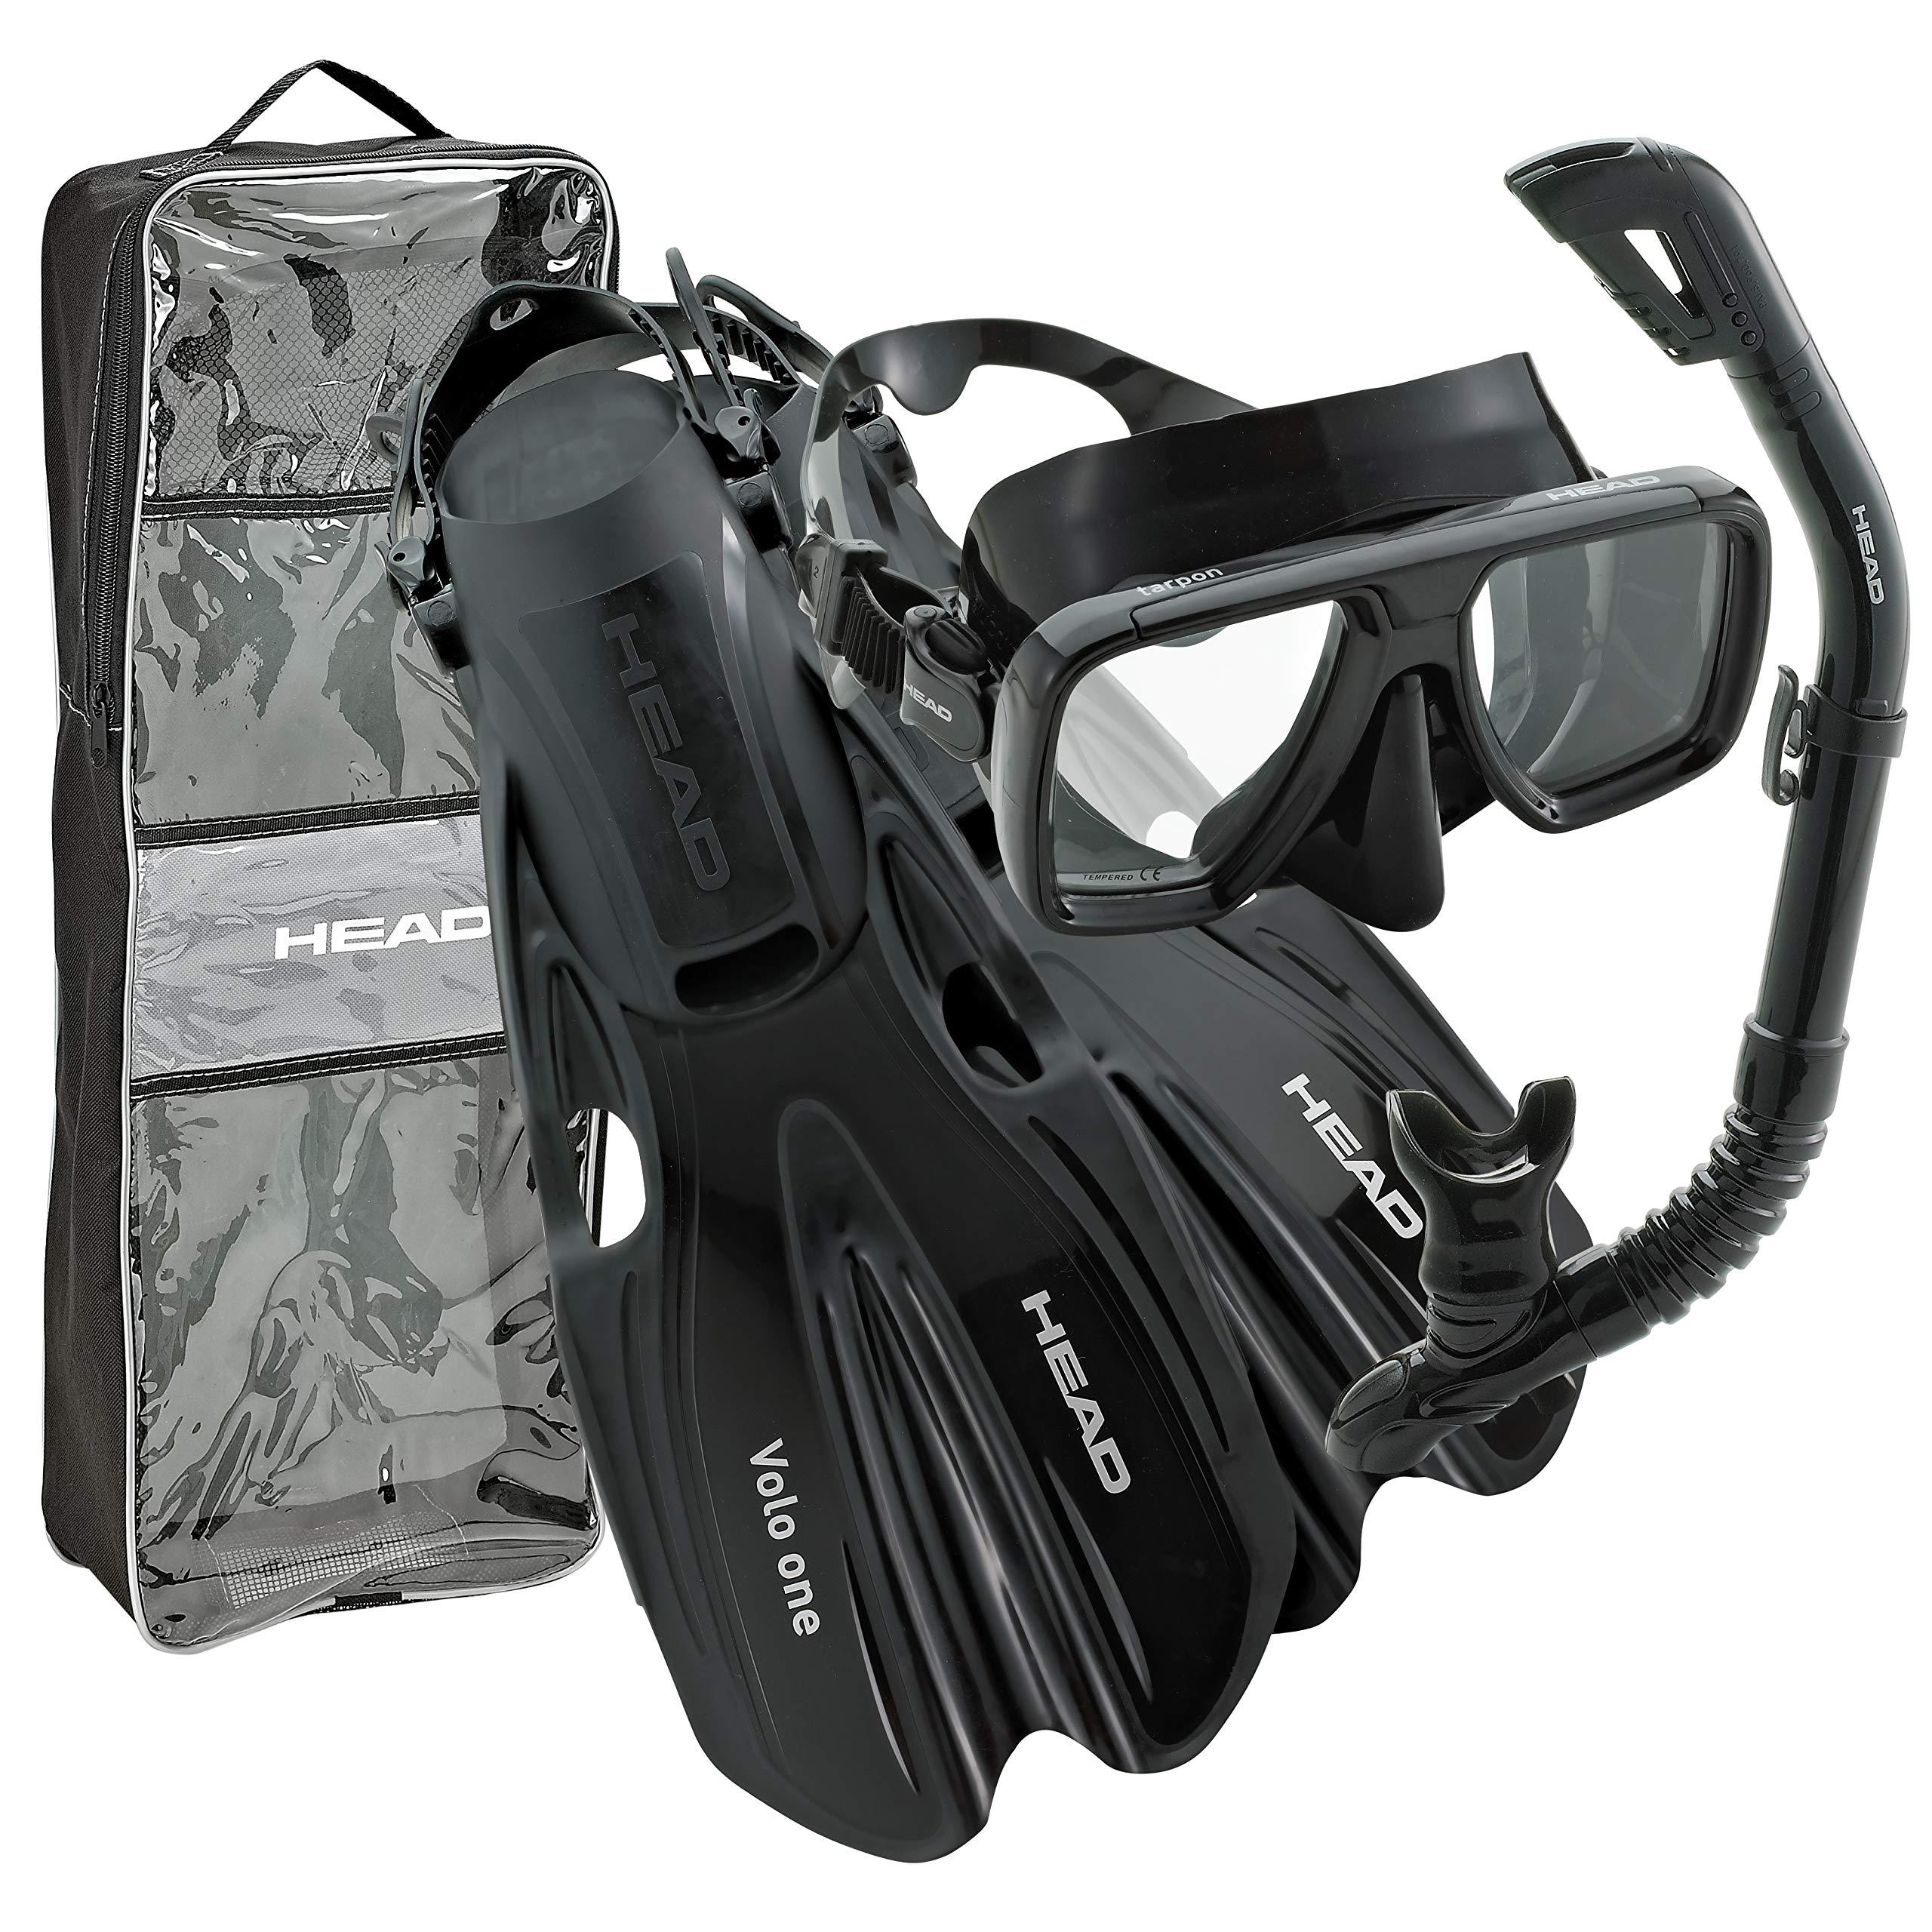 HEAD By Mares Tarpon Travel Friendly Premium Mask Fin Snorkel Set, Black, Small, (4-6)